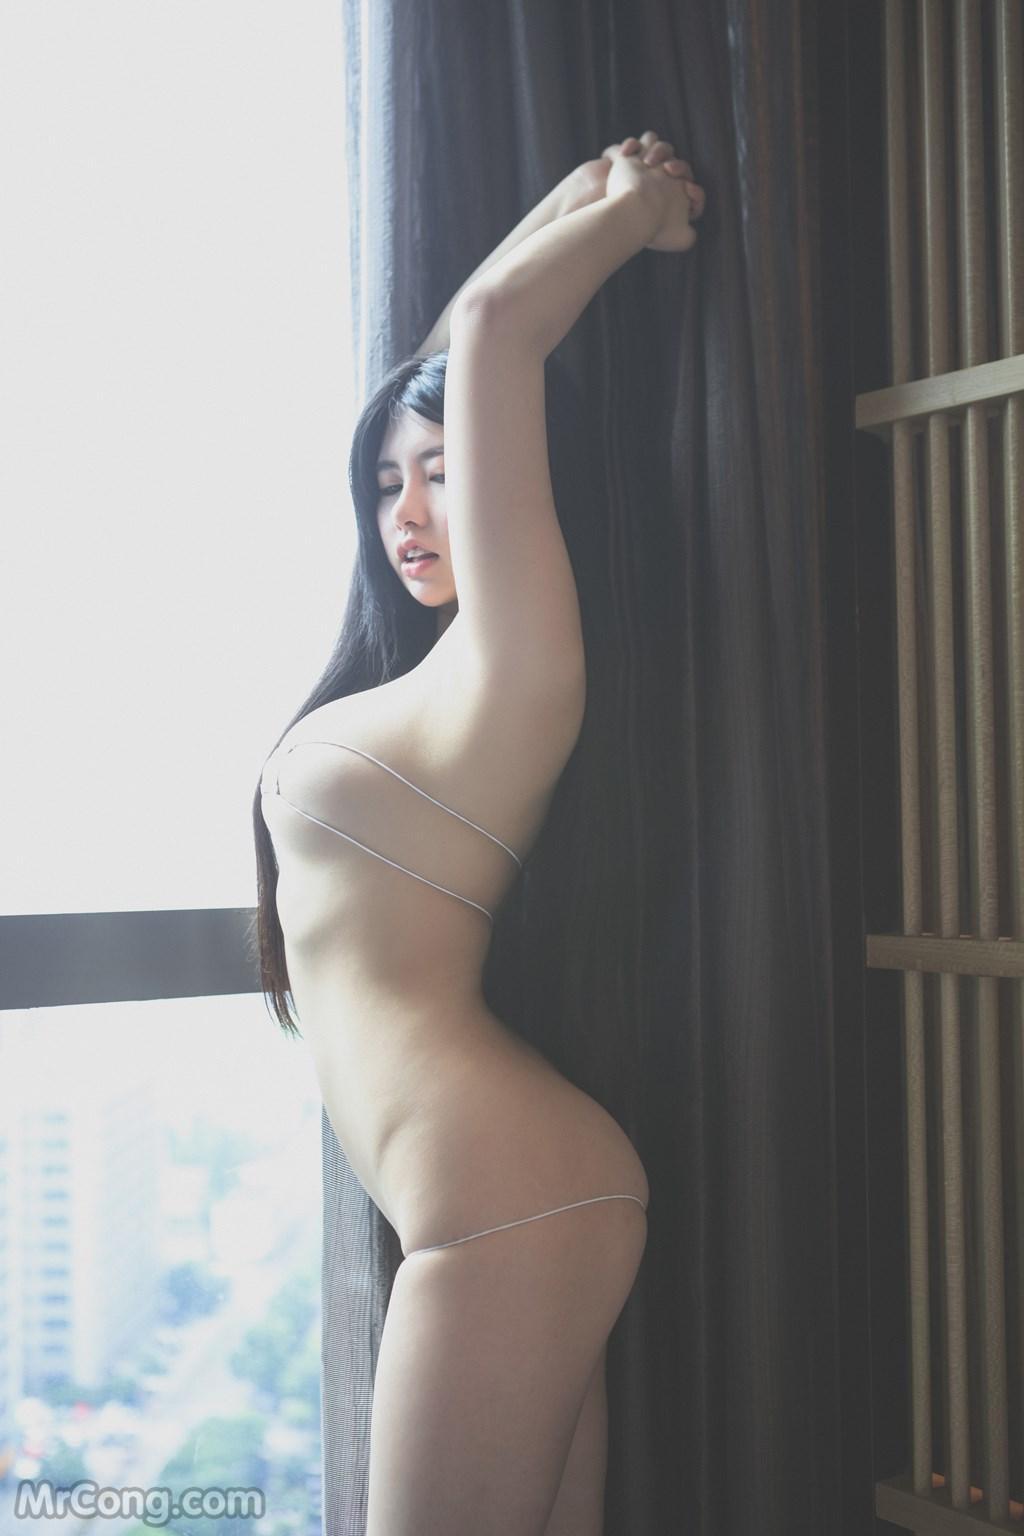 Image BoLoli-2017-06-06-Vol.066-Selena-Na-Lu-MrCong.com-007 in post BoLoli 2017-06-06 Vol.066: Người mẫu Selena (娜露) (35 ảnh)